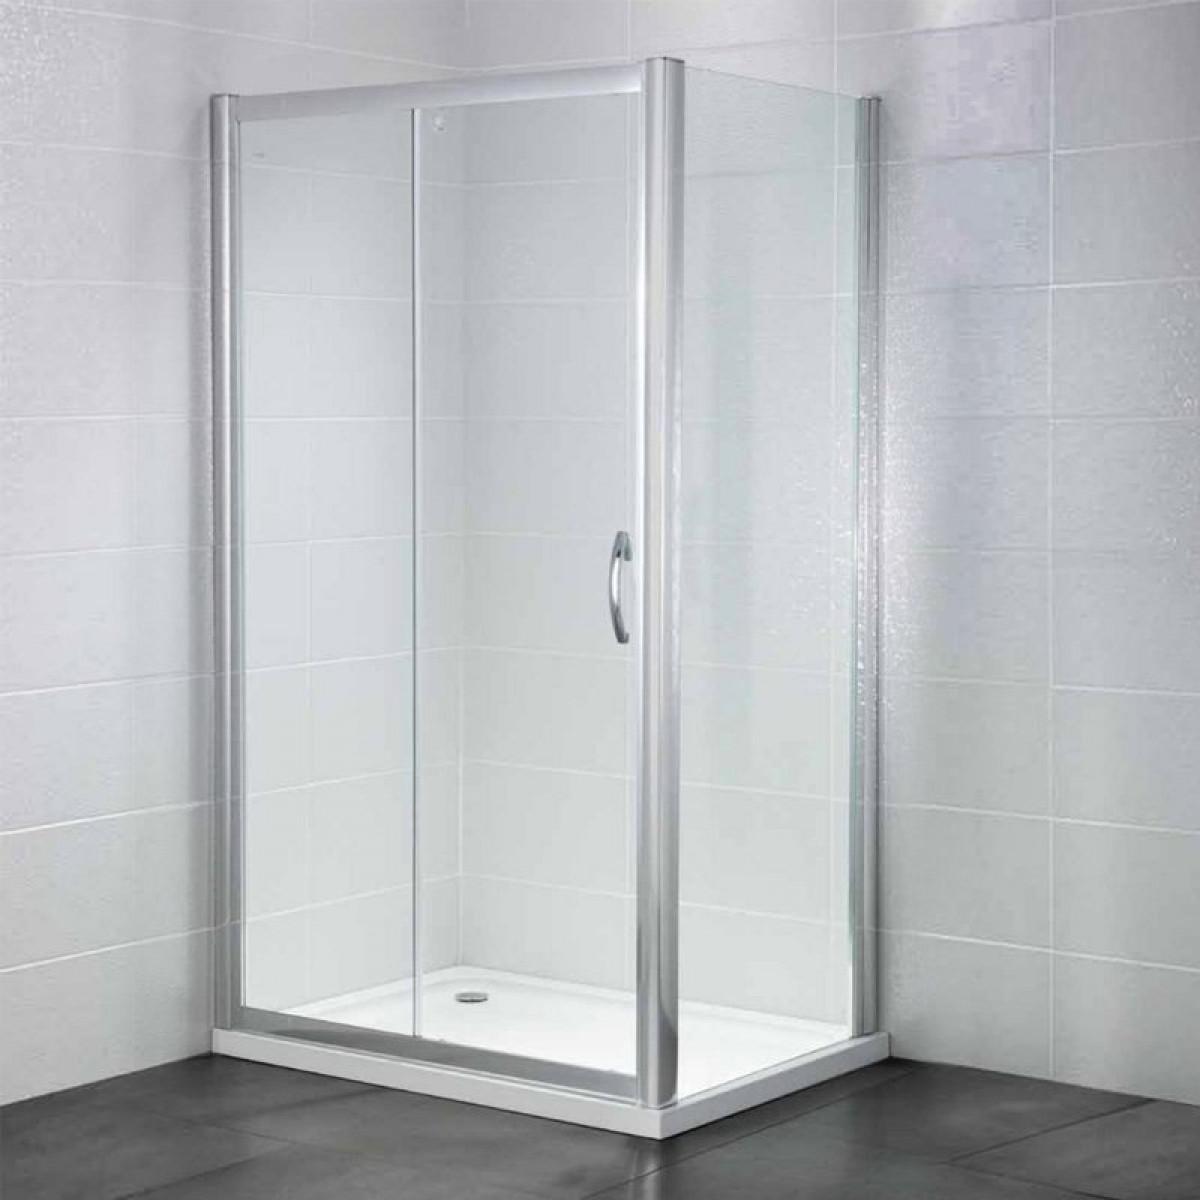 April identiti2 sliding door 1500mm for 1500 sliding shower door